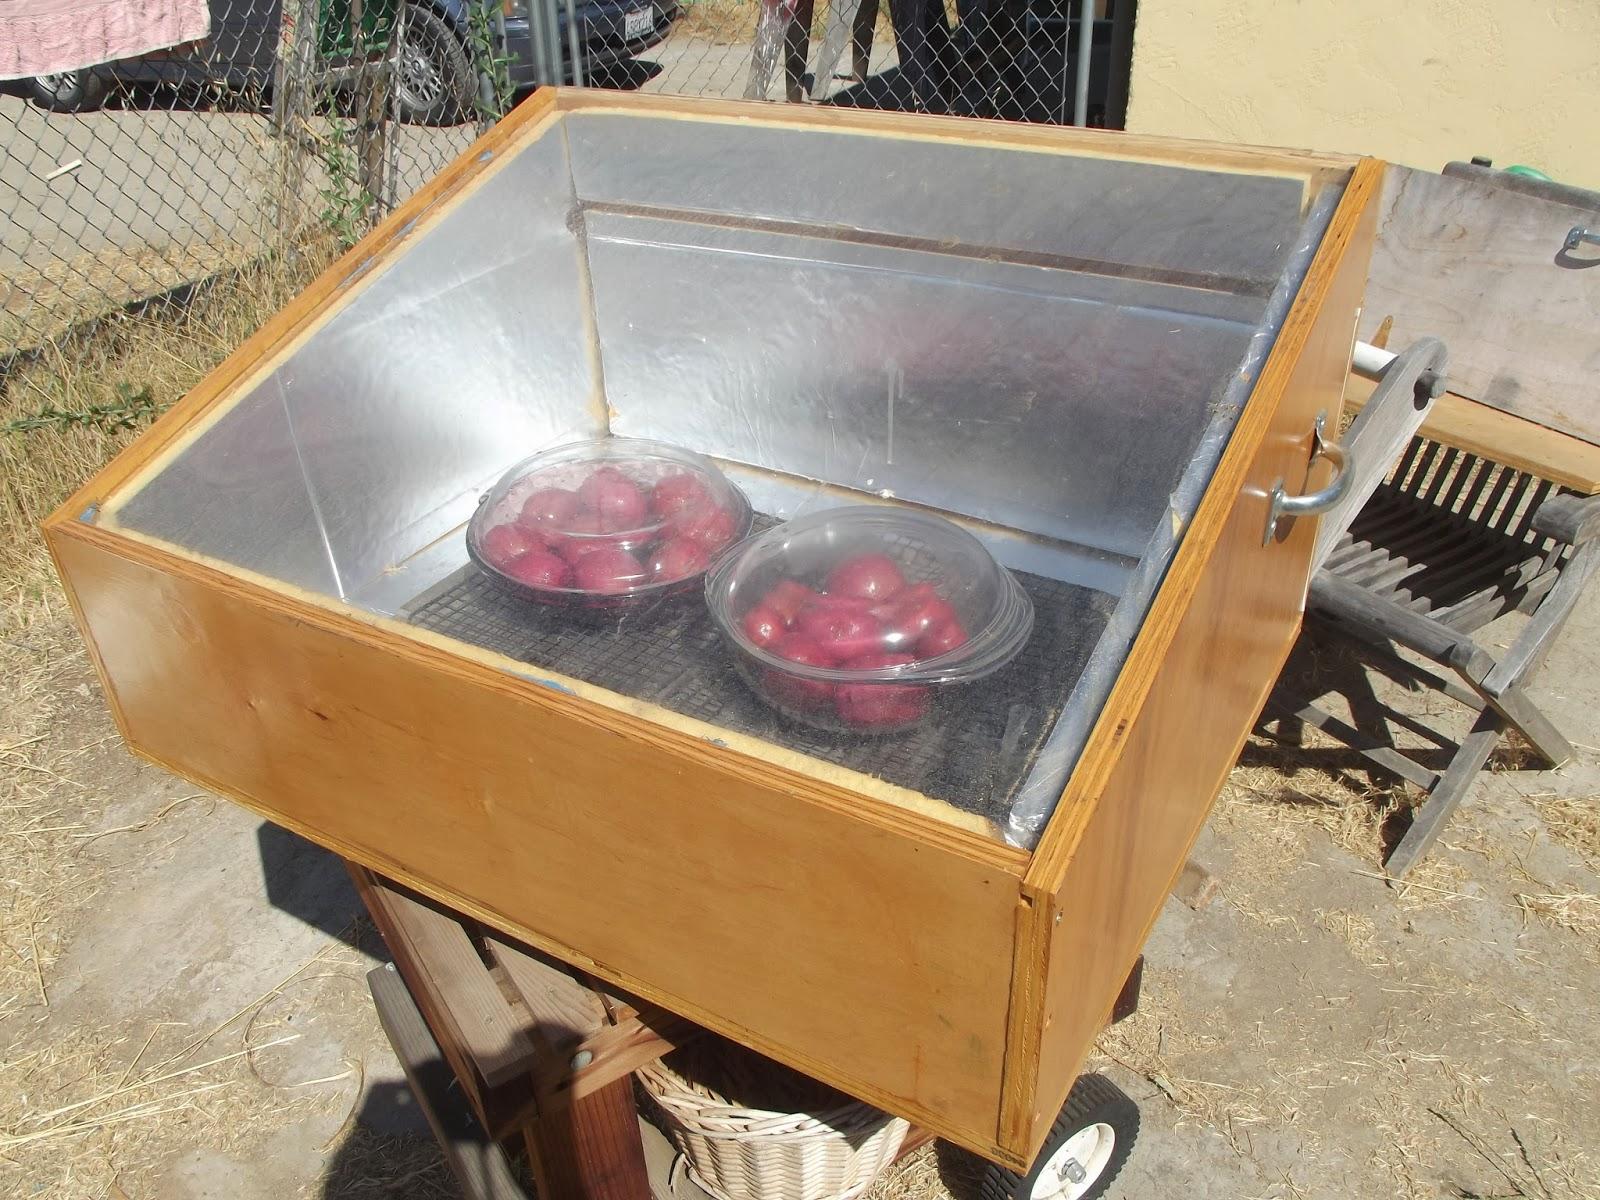 Nonnie S Blog Great Solar Oven